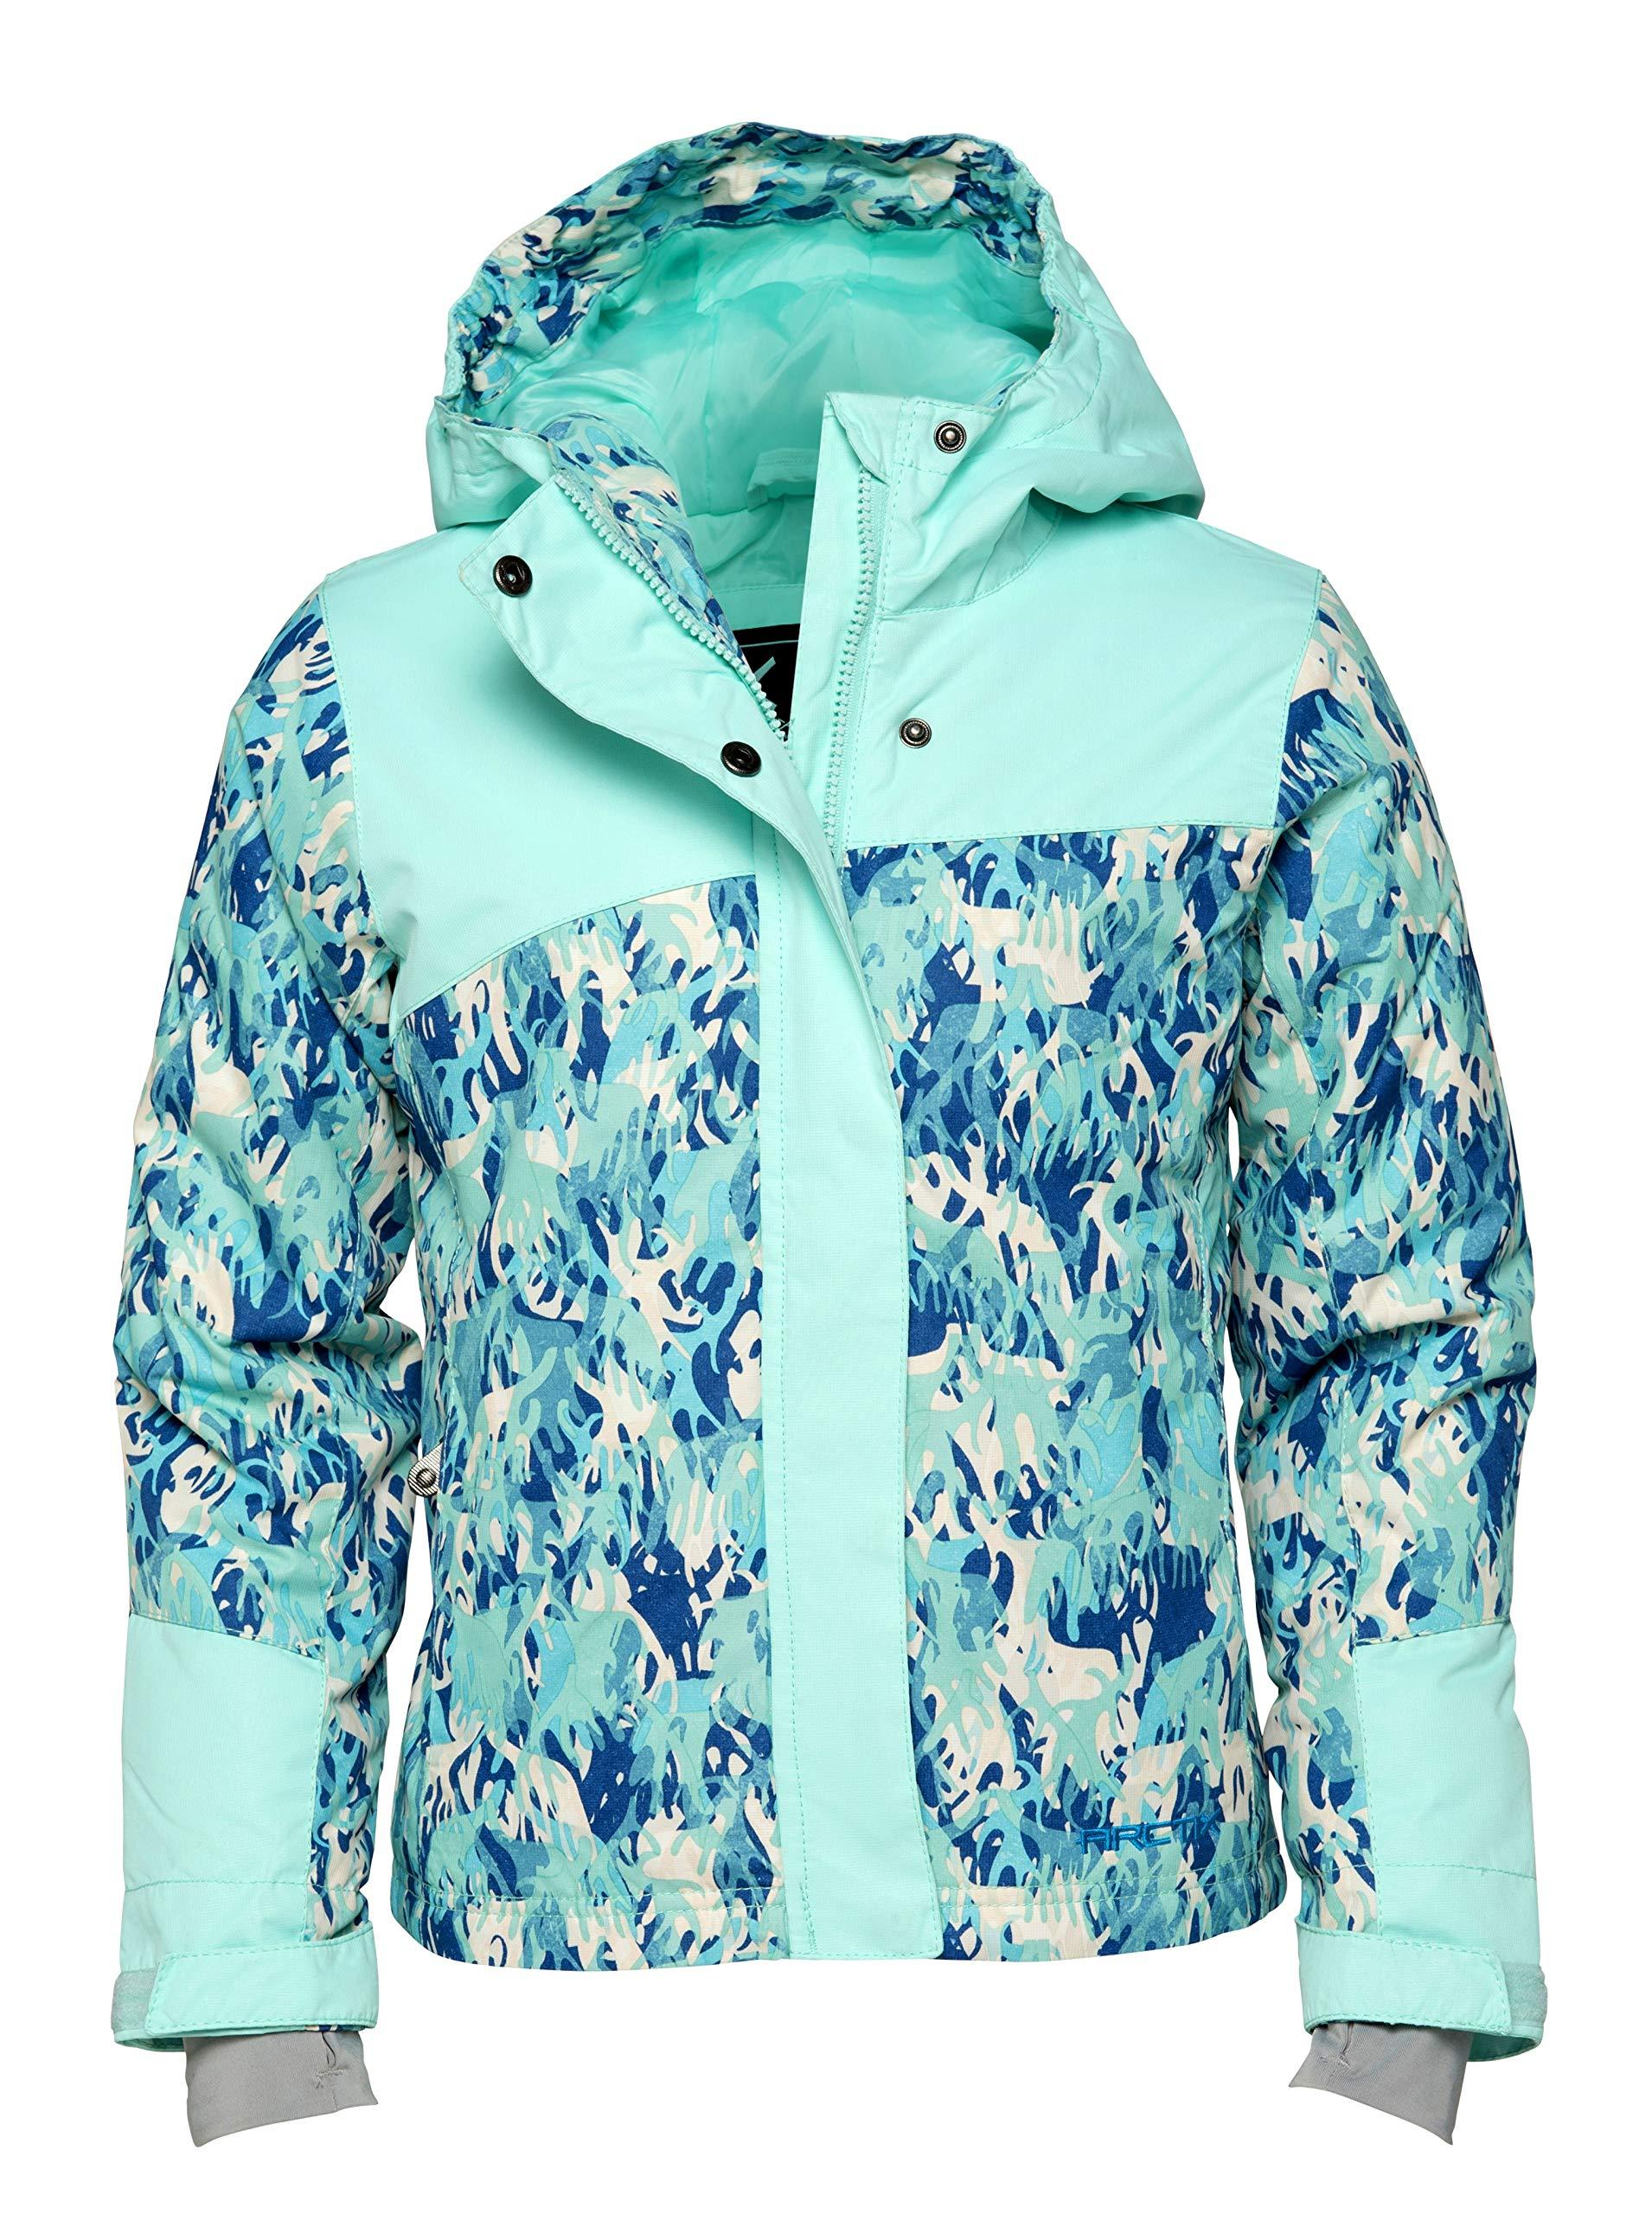 Arctix Girls Jackalope Insulated Winter Jacket